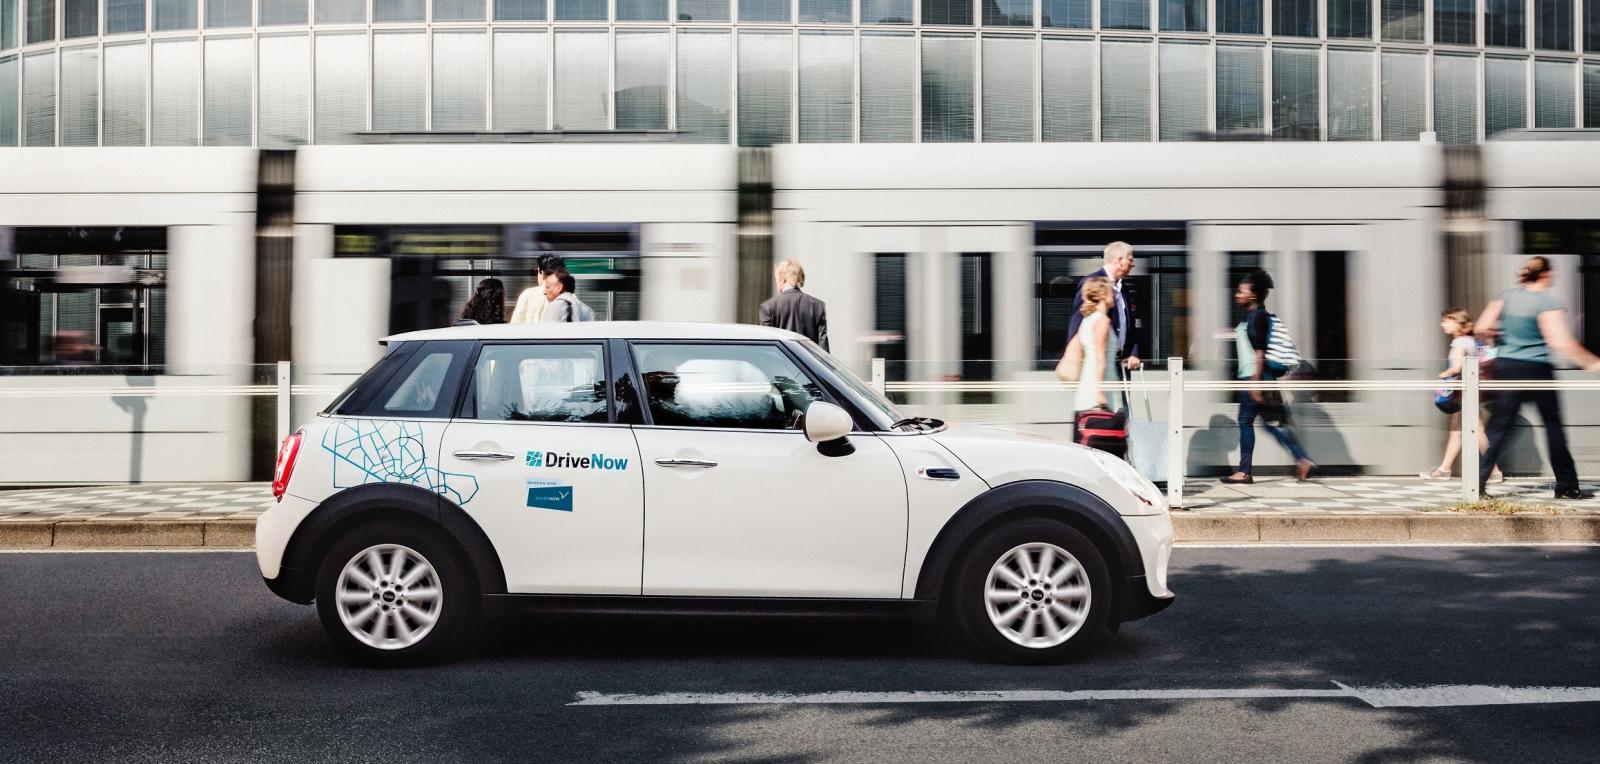 DriveNow_Dusseldorf_MINI_3p_Driving_Public_Transport3